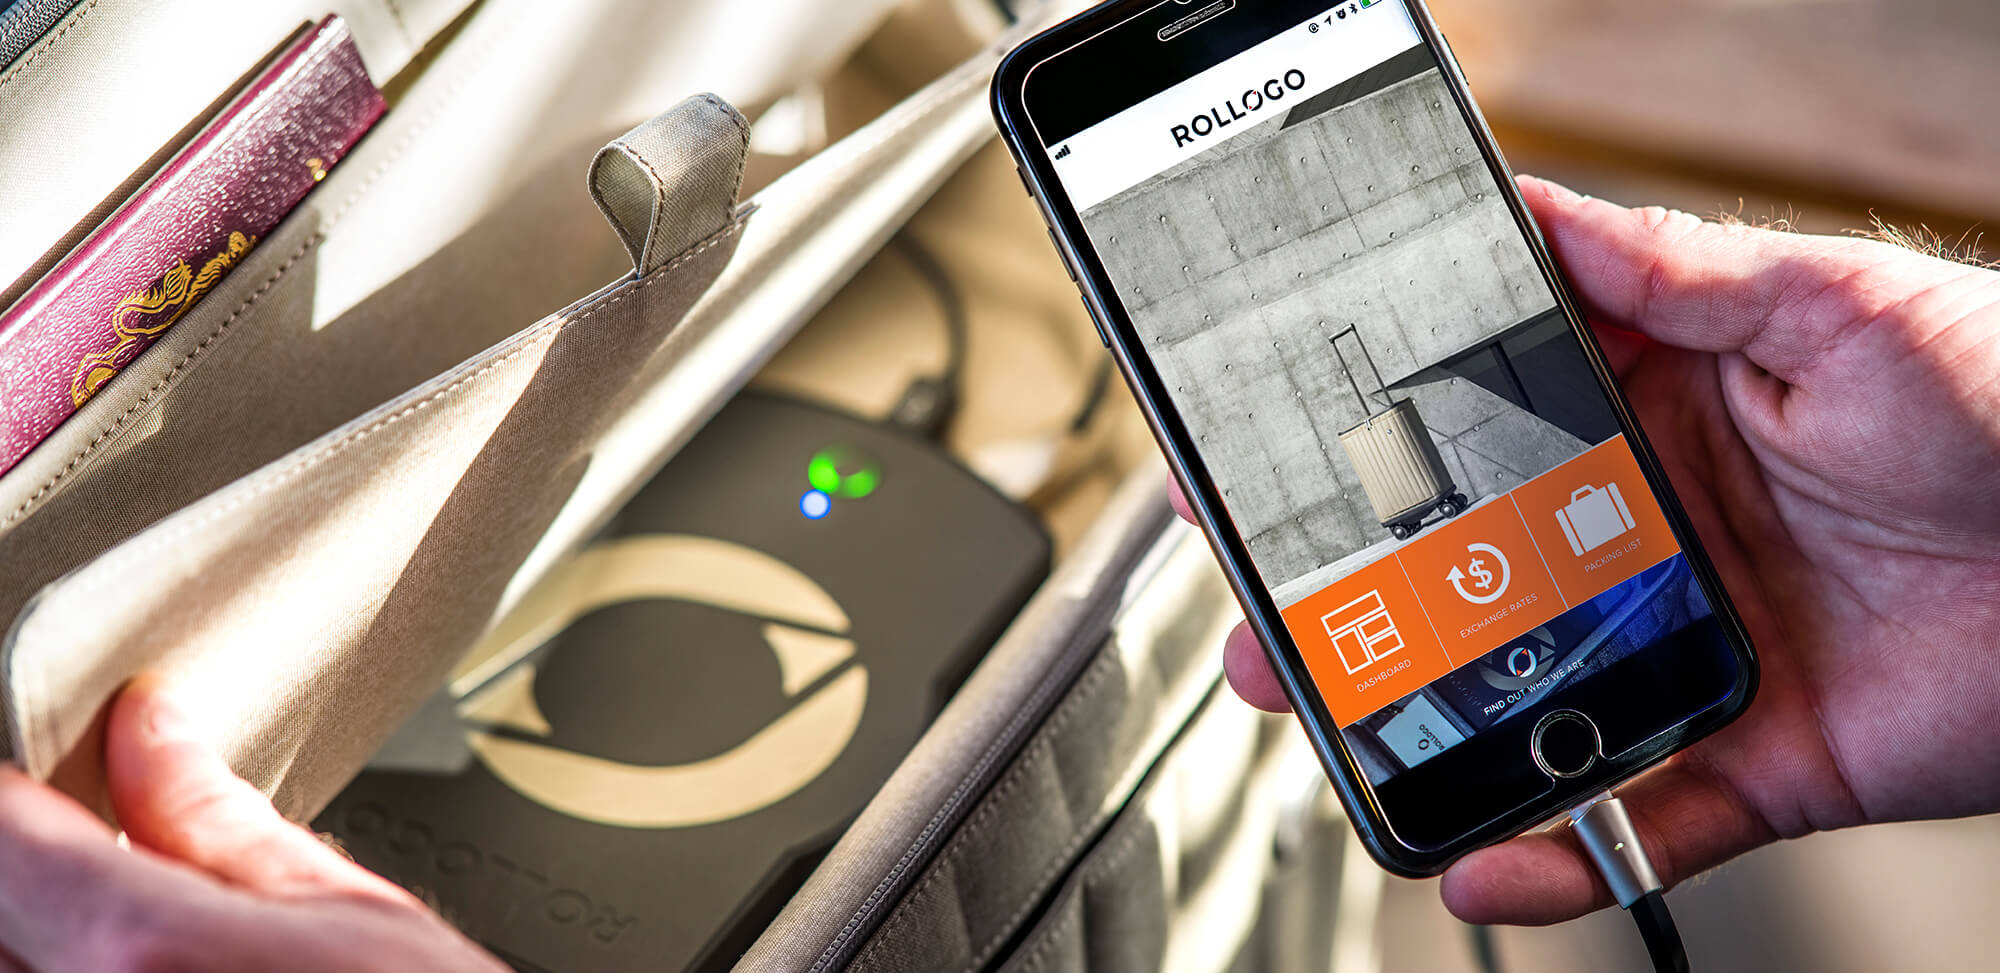 Rollogo-Escape-smart-luggage-mobile-office-App.jpg